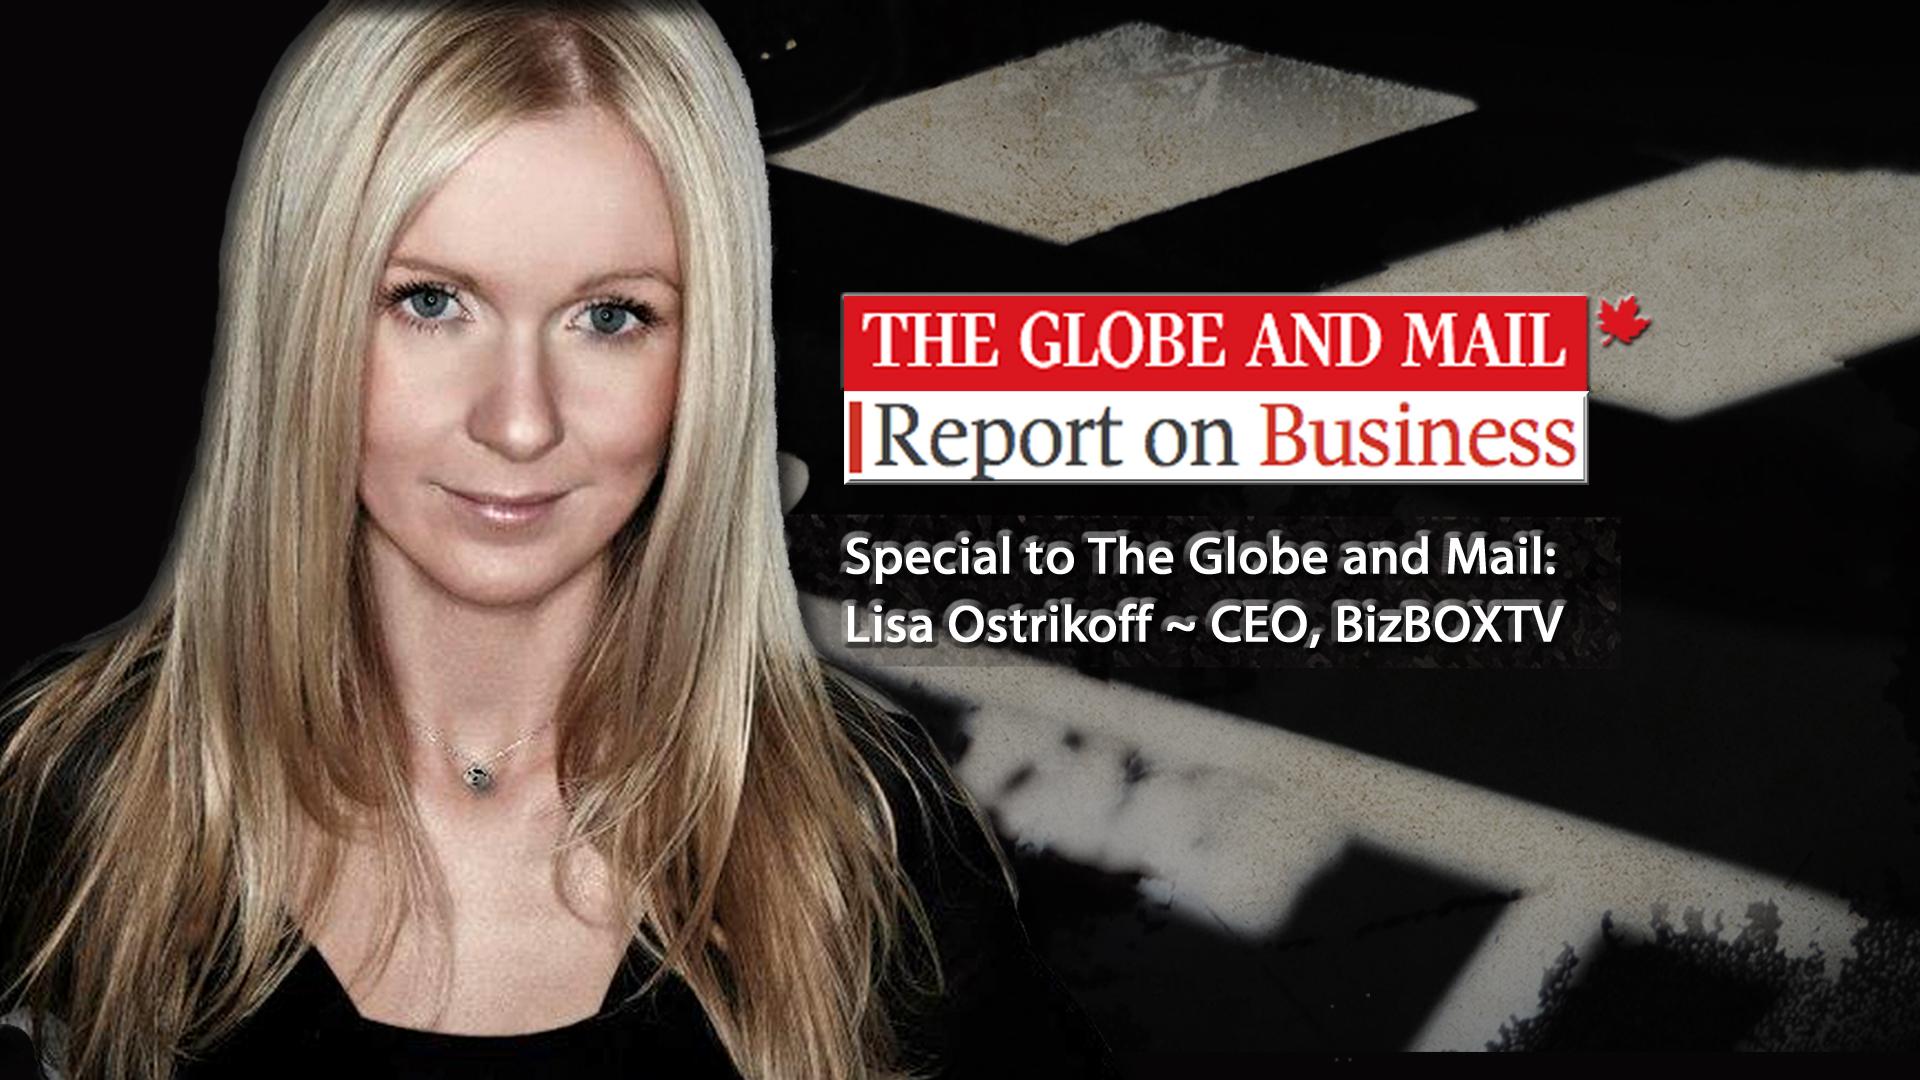 Online Video Production Calgary Toronto Vancouver Lisa Ostrikoff BizBOXTV